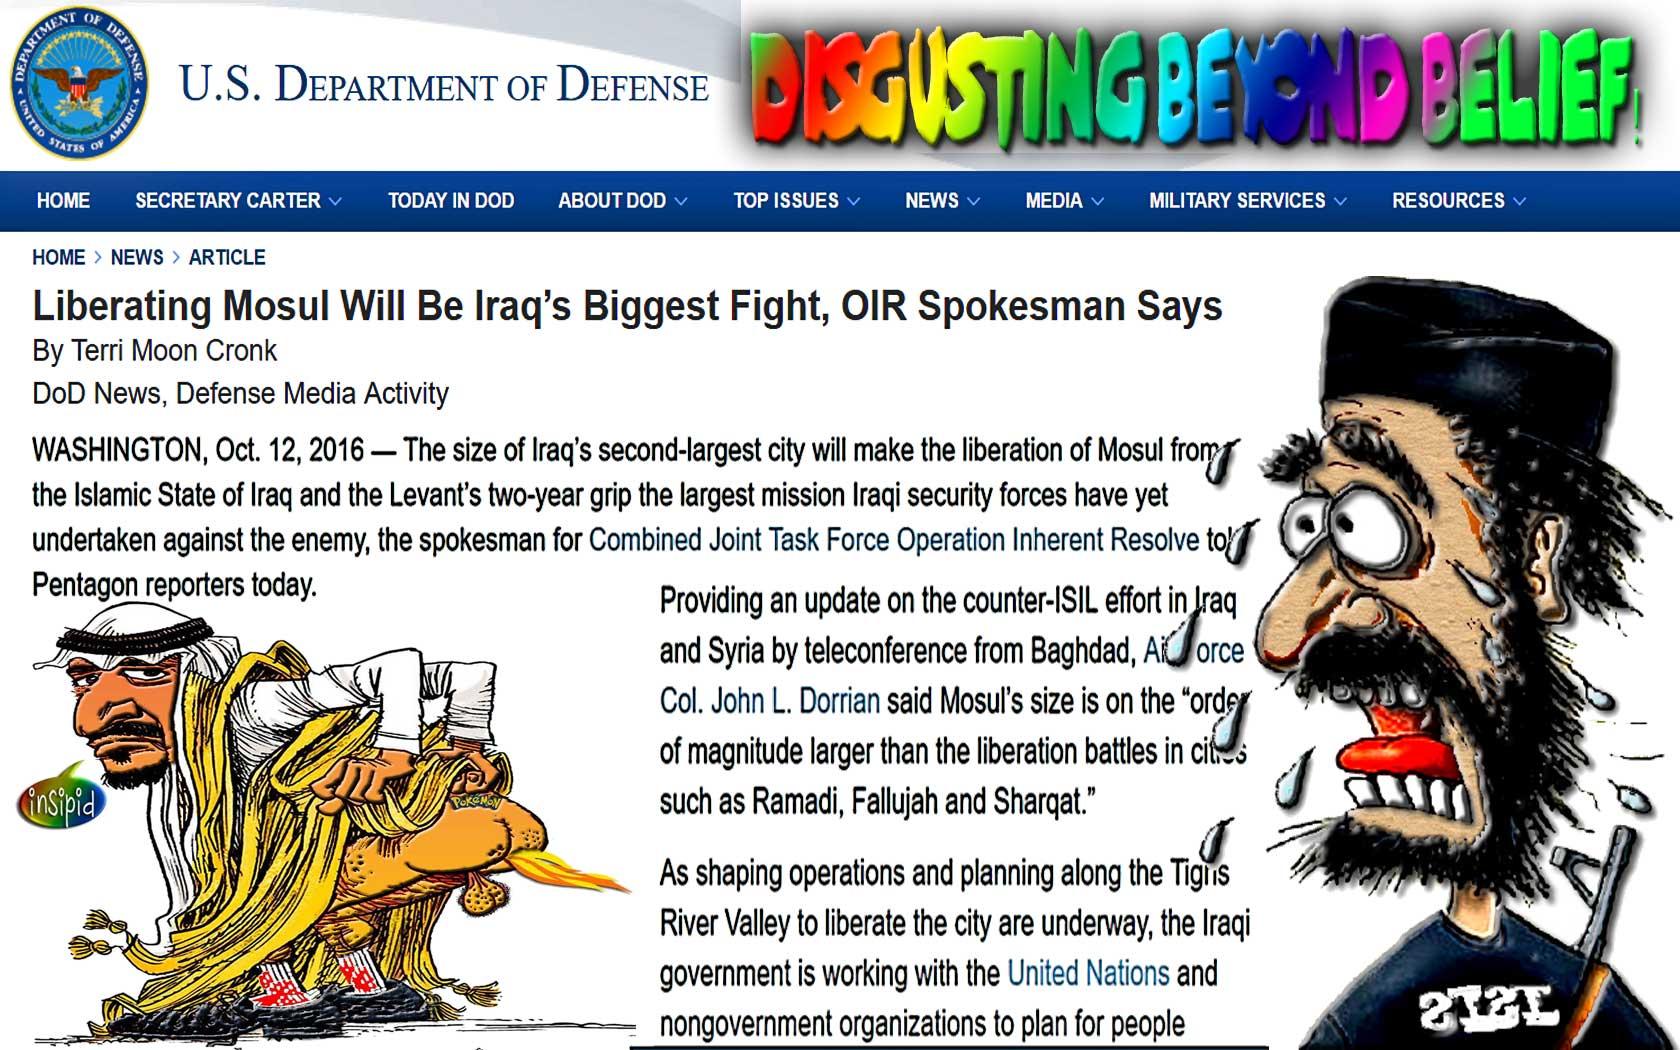 Disgusting beyond belief! Liberating Mosul Iraq's Biggest Fight, Terri Moon Cronk DoD News, WTF!